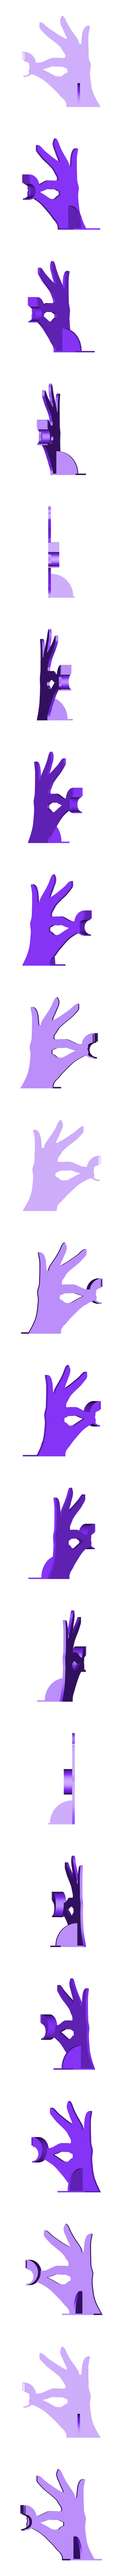 Hand_SX_EUMAKERS sx.stl Download free STL file Biblio - Bookends • 3D printable model, EUMAKERS